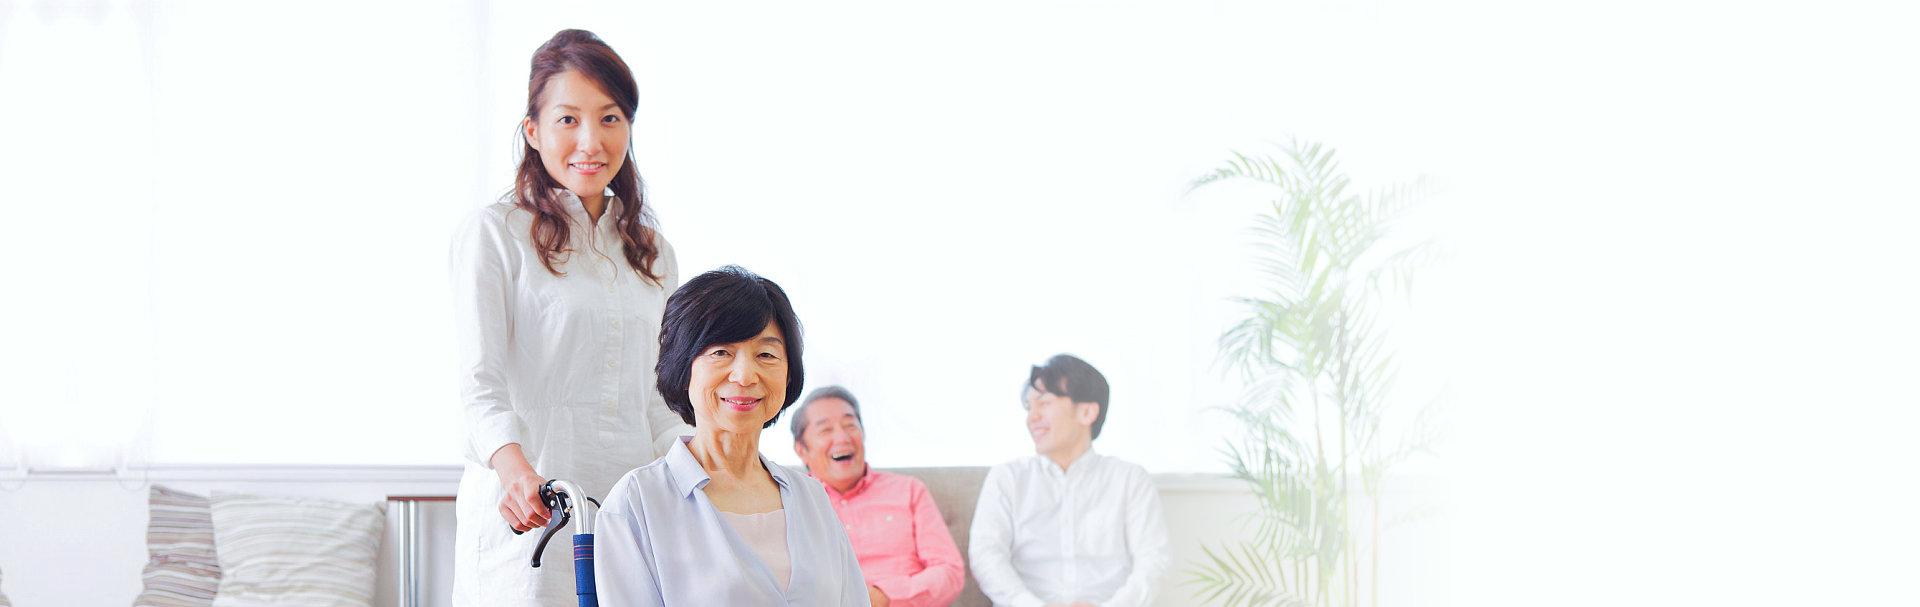 Smiling japanese people